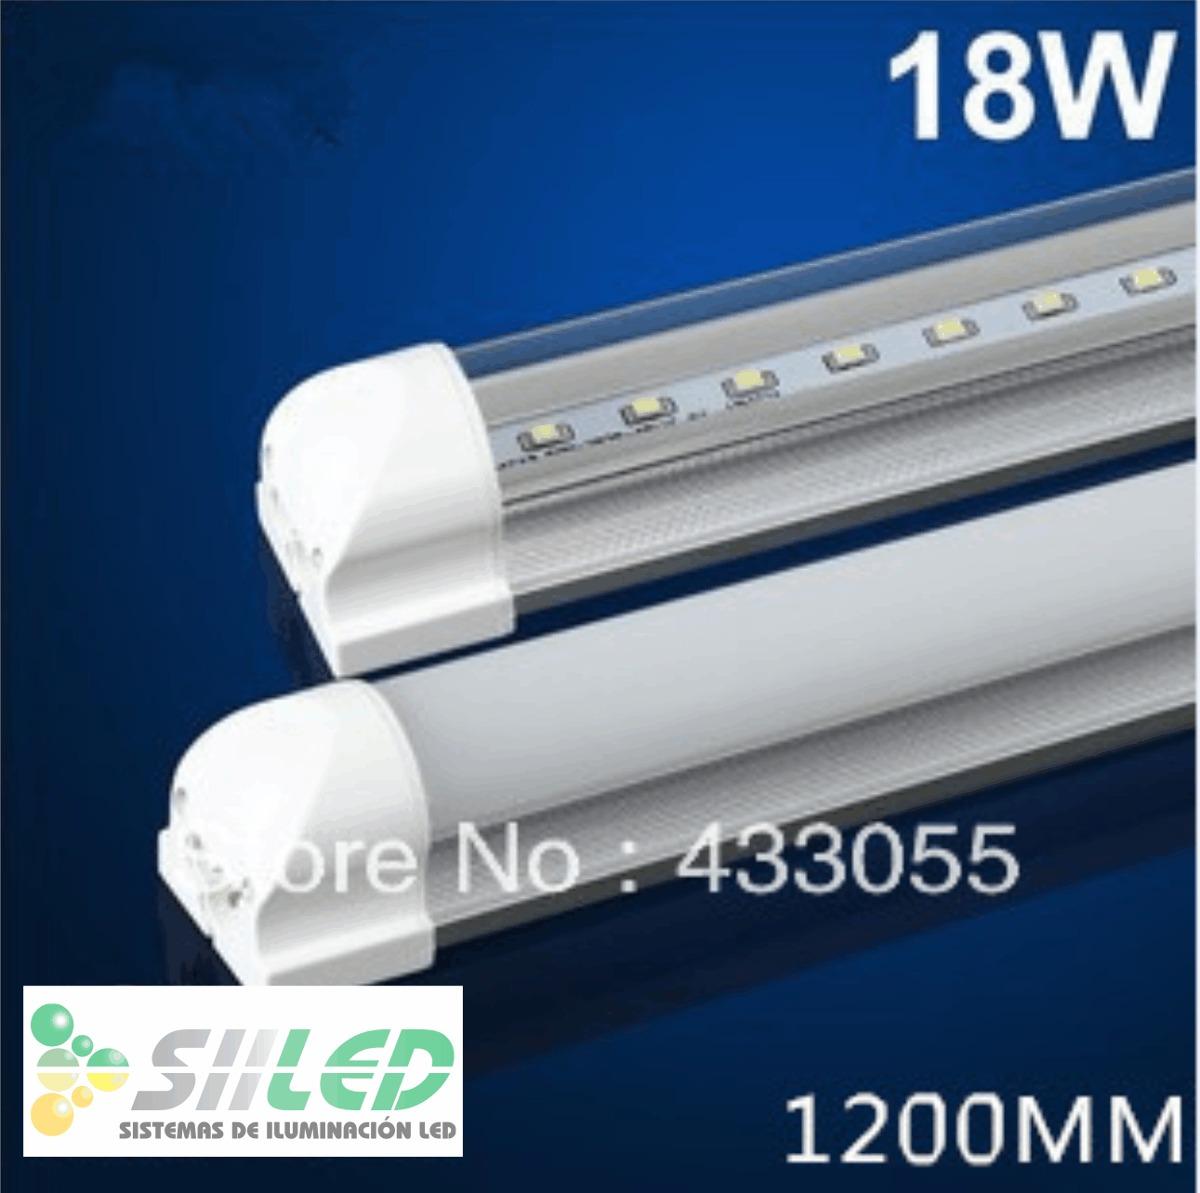 Tubo de led t8 de 18w con base de aluminio - Lamparas de tubo led ...